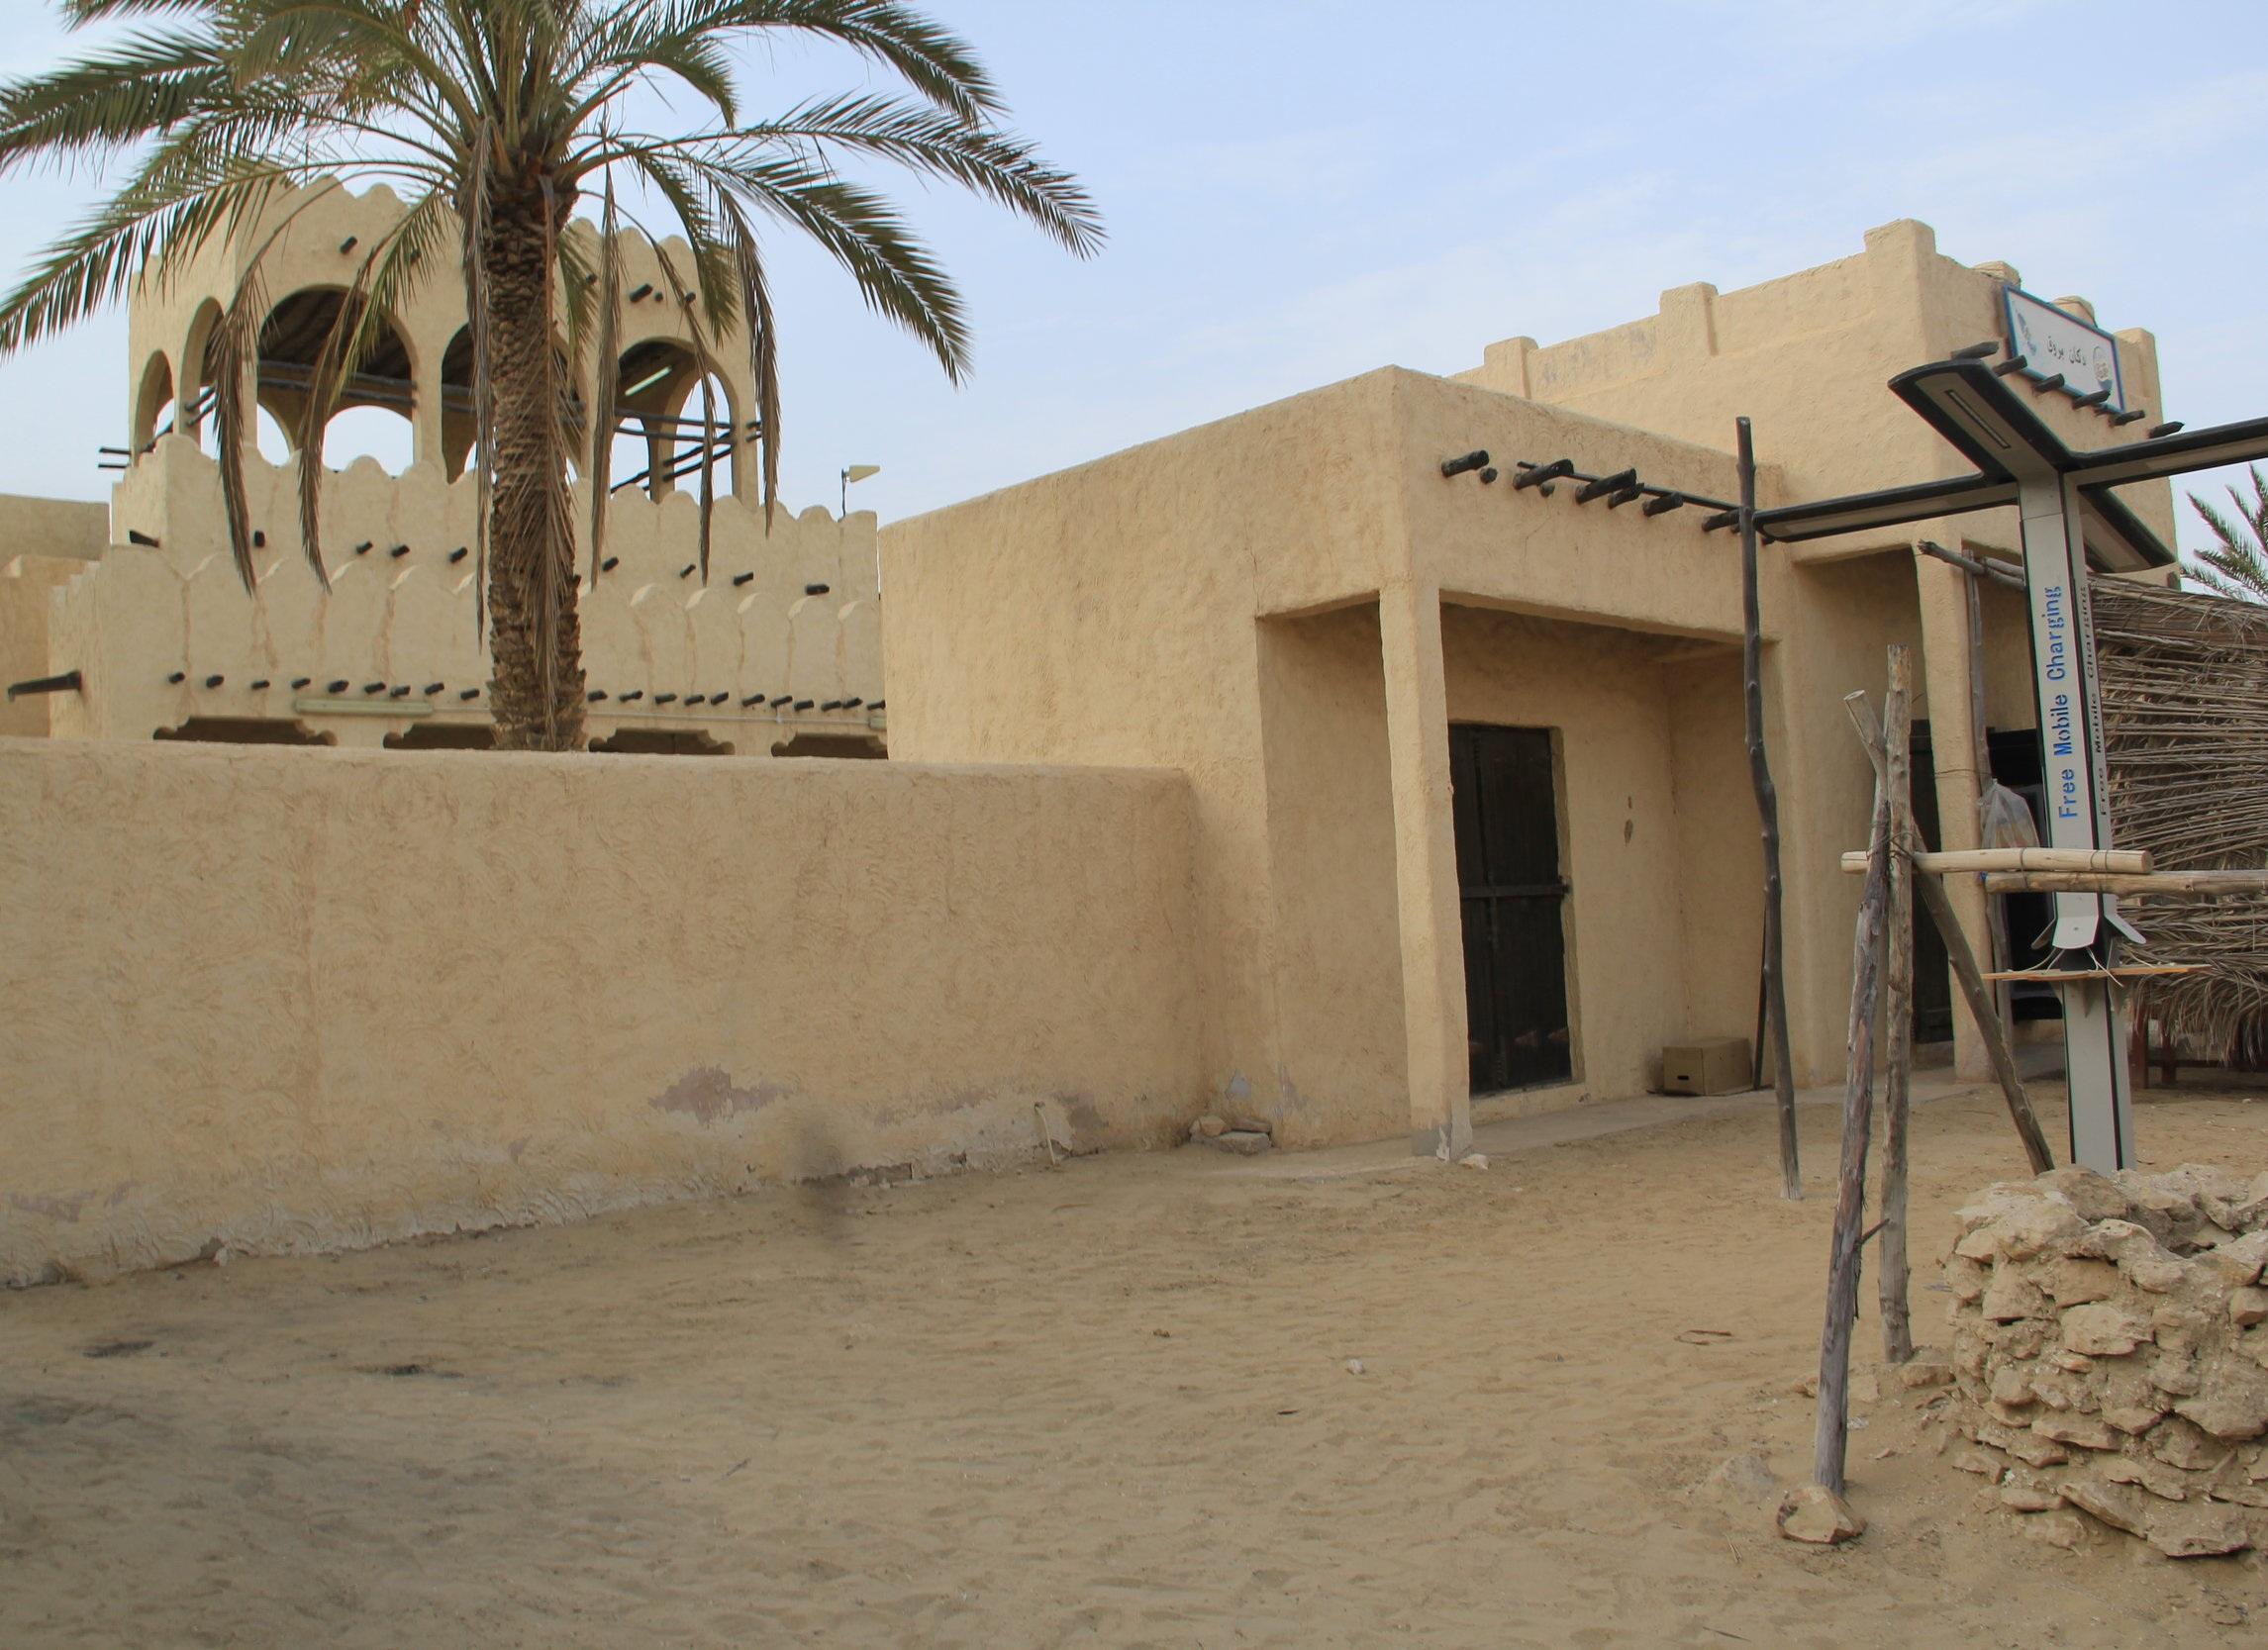 Film City, Remember Megan Fox! Film City, Zekreet, Qatar. Taken by Tyanna LC